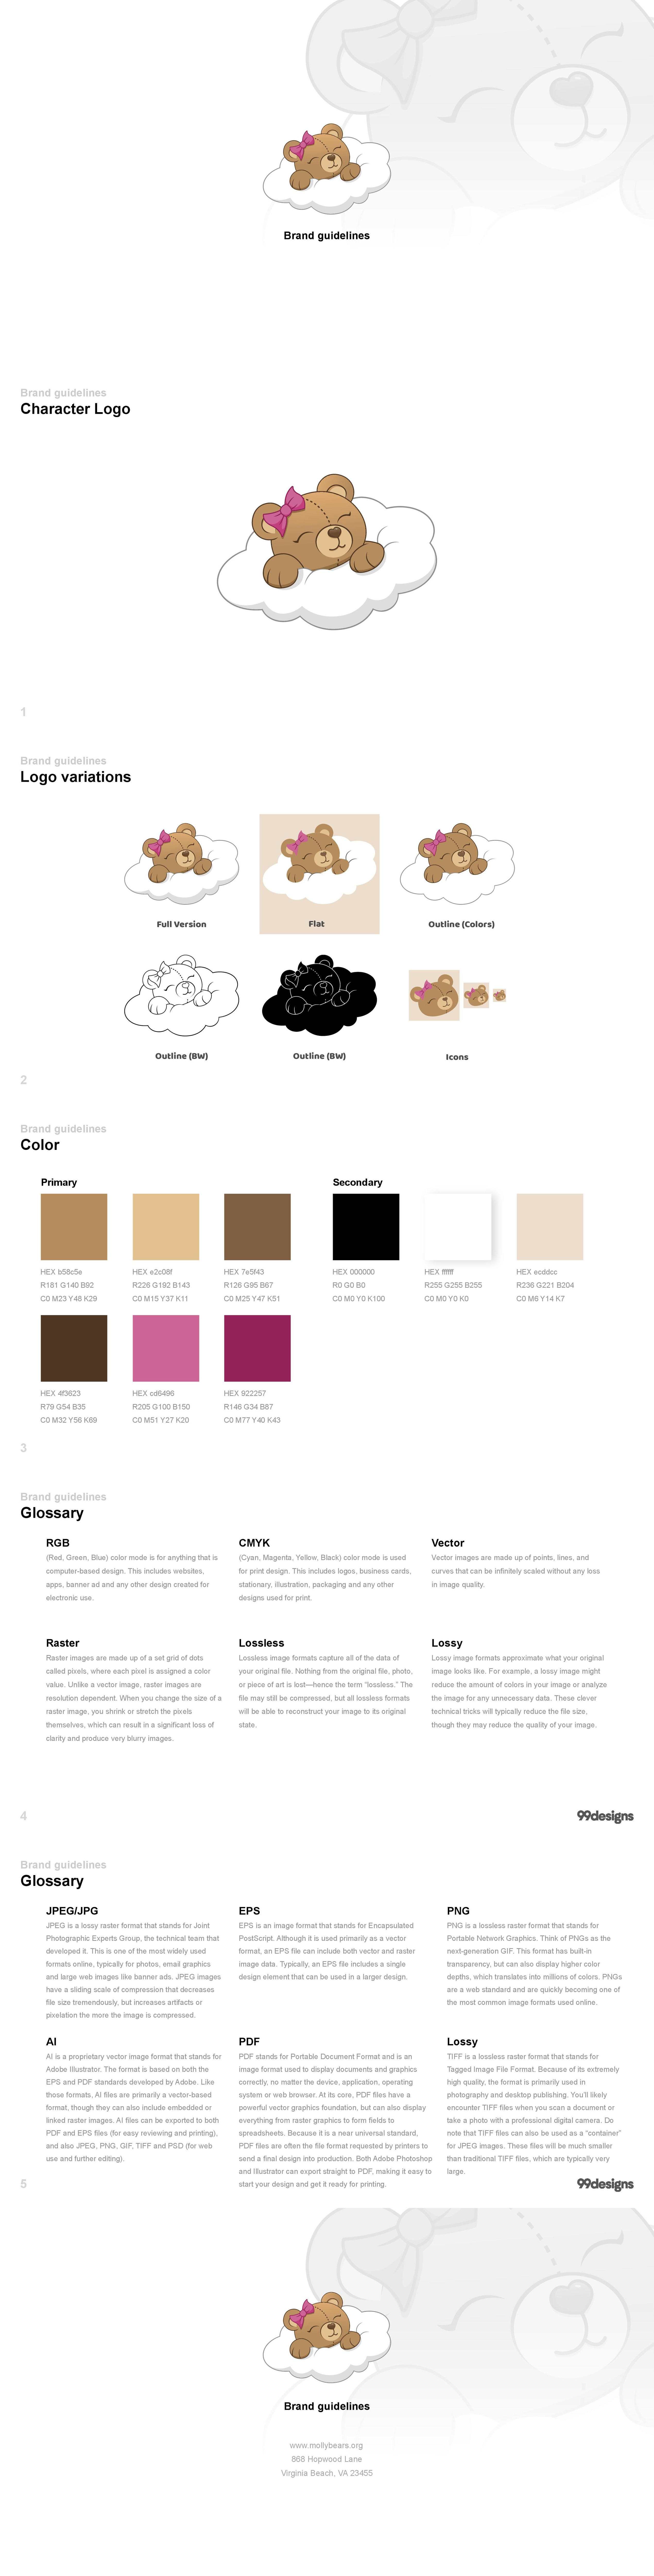 99NONPROFITS WINNER: Teddy Bear Logo Redesign & Brand Guide